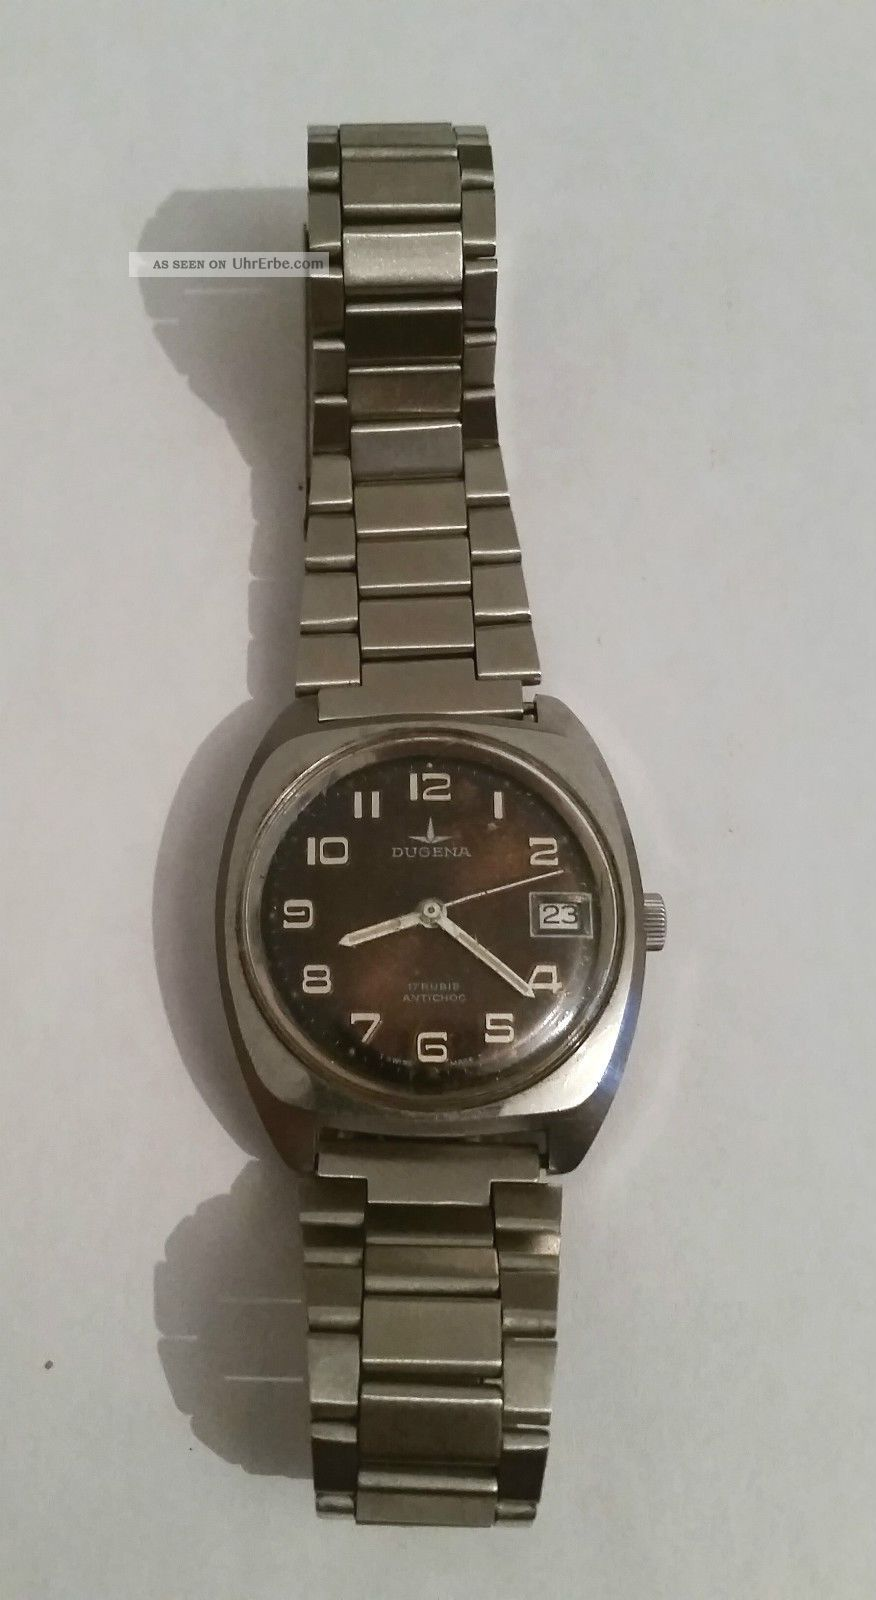 Dugena 17 Rubis Antichoc Analog Handaufzug Datumsanzeige Edelstahl Geprüft Vwp Armbanduhren Bild